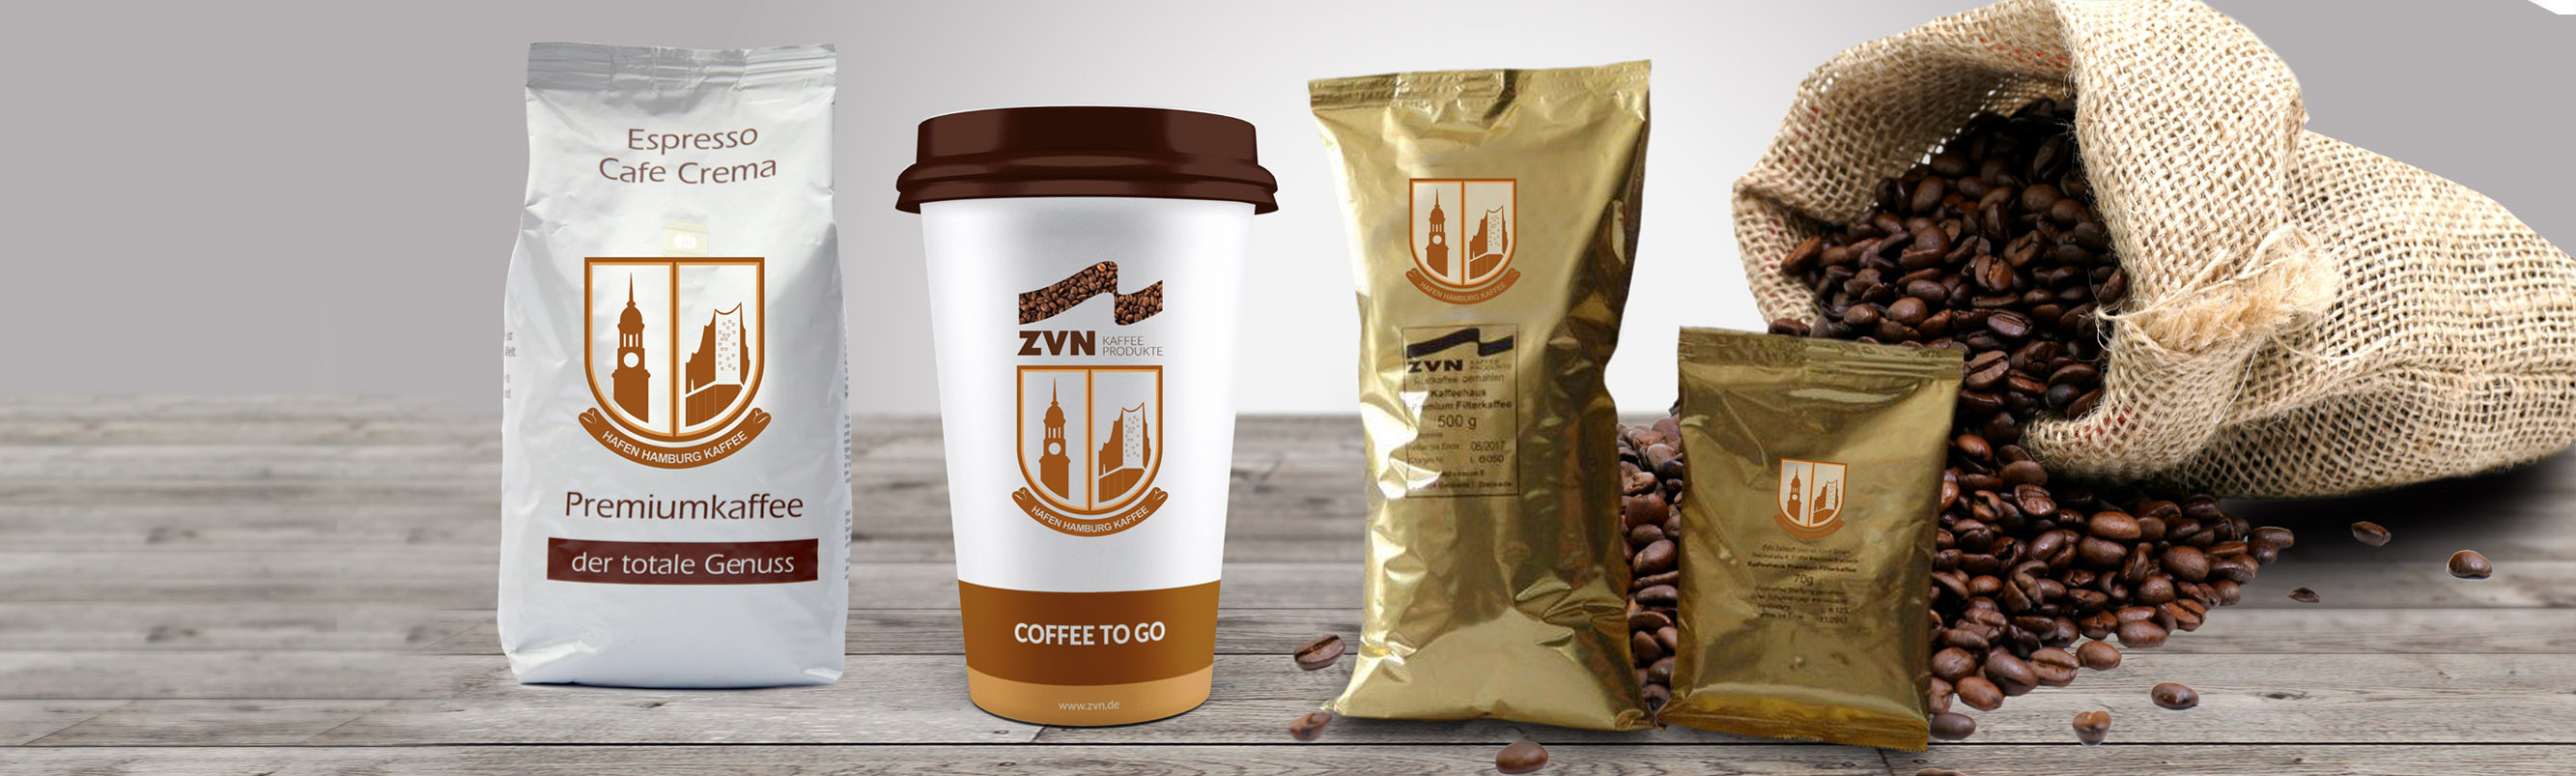 slider-zvnkaffeeprodukte